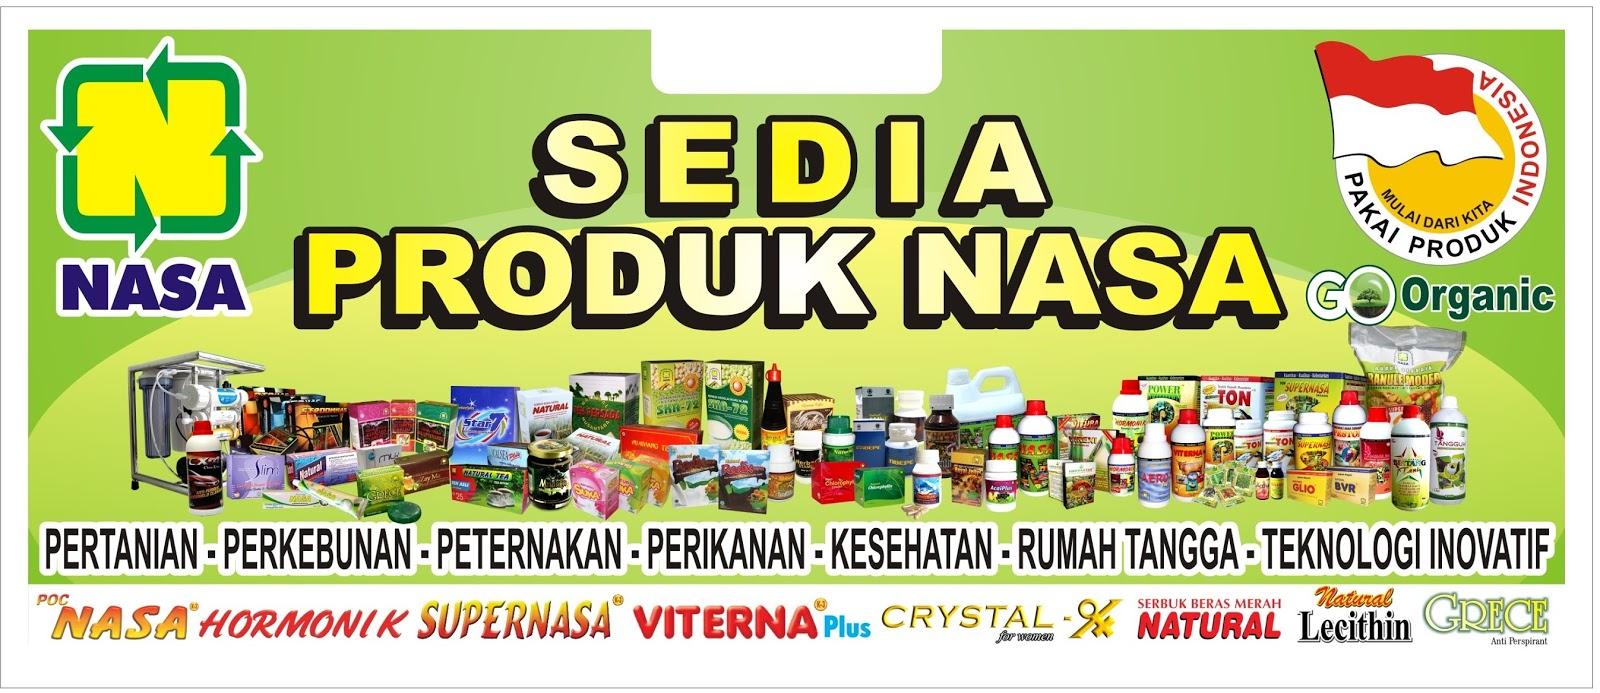 Distributor Nasa Mojokerto Ska 72 Serbuk Kedelai Alami Organik